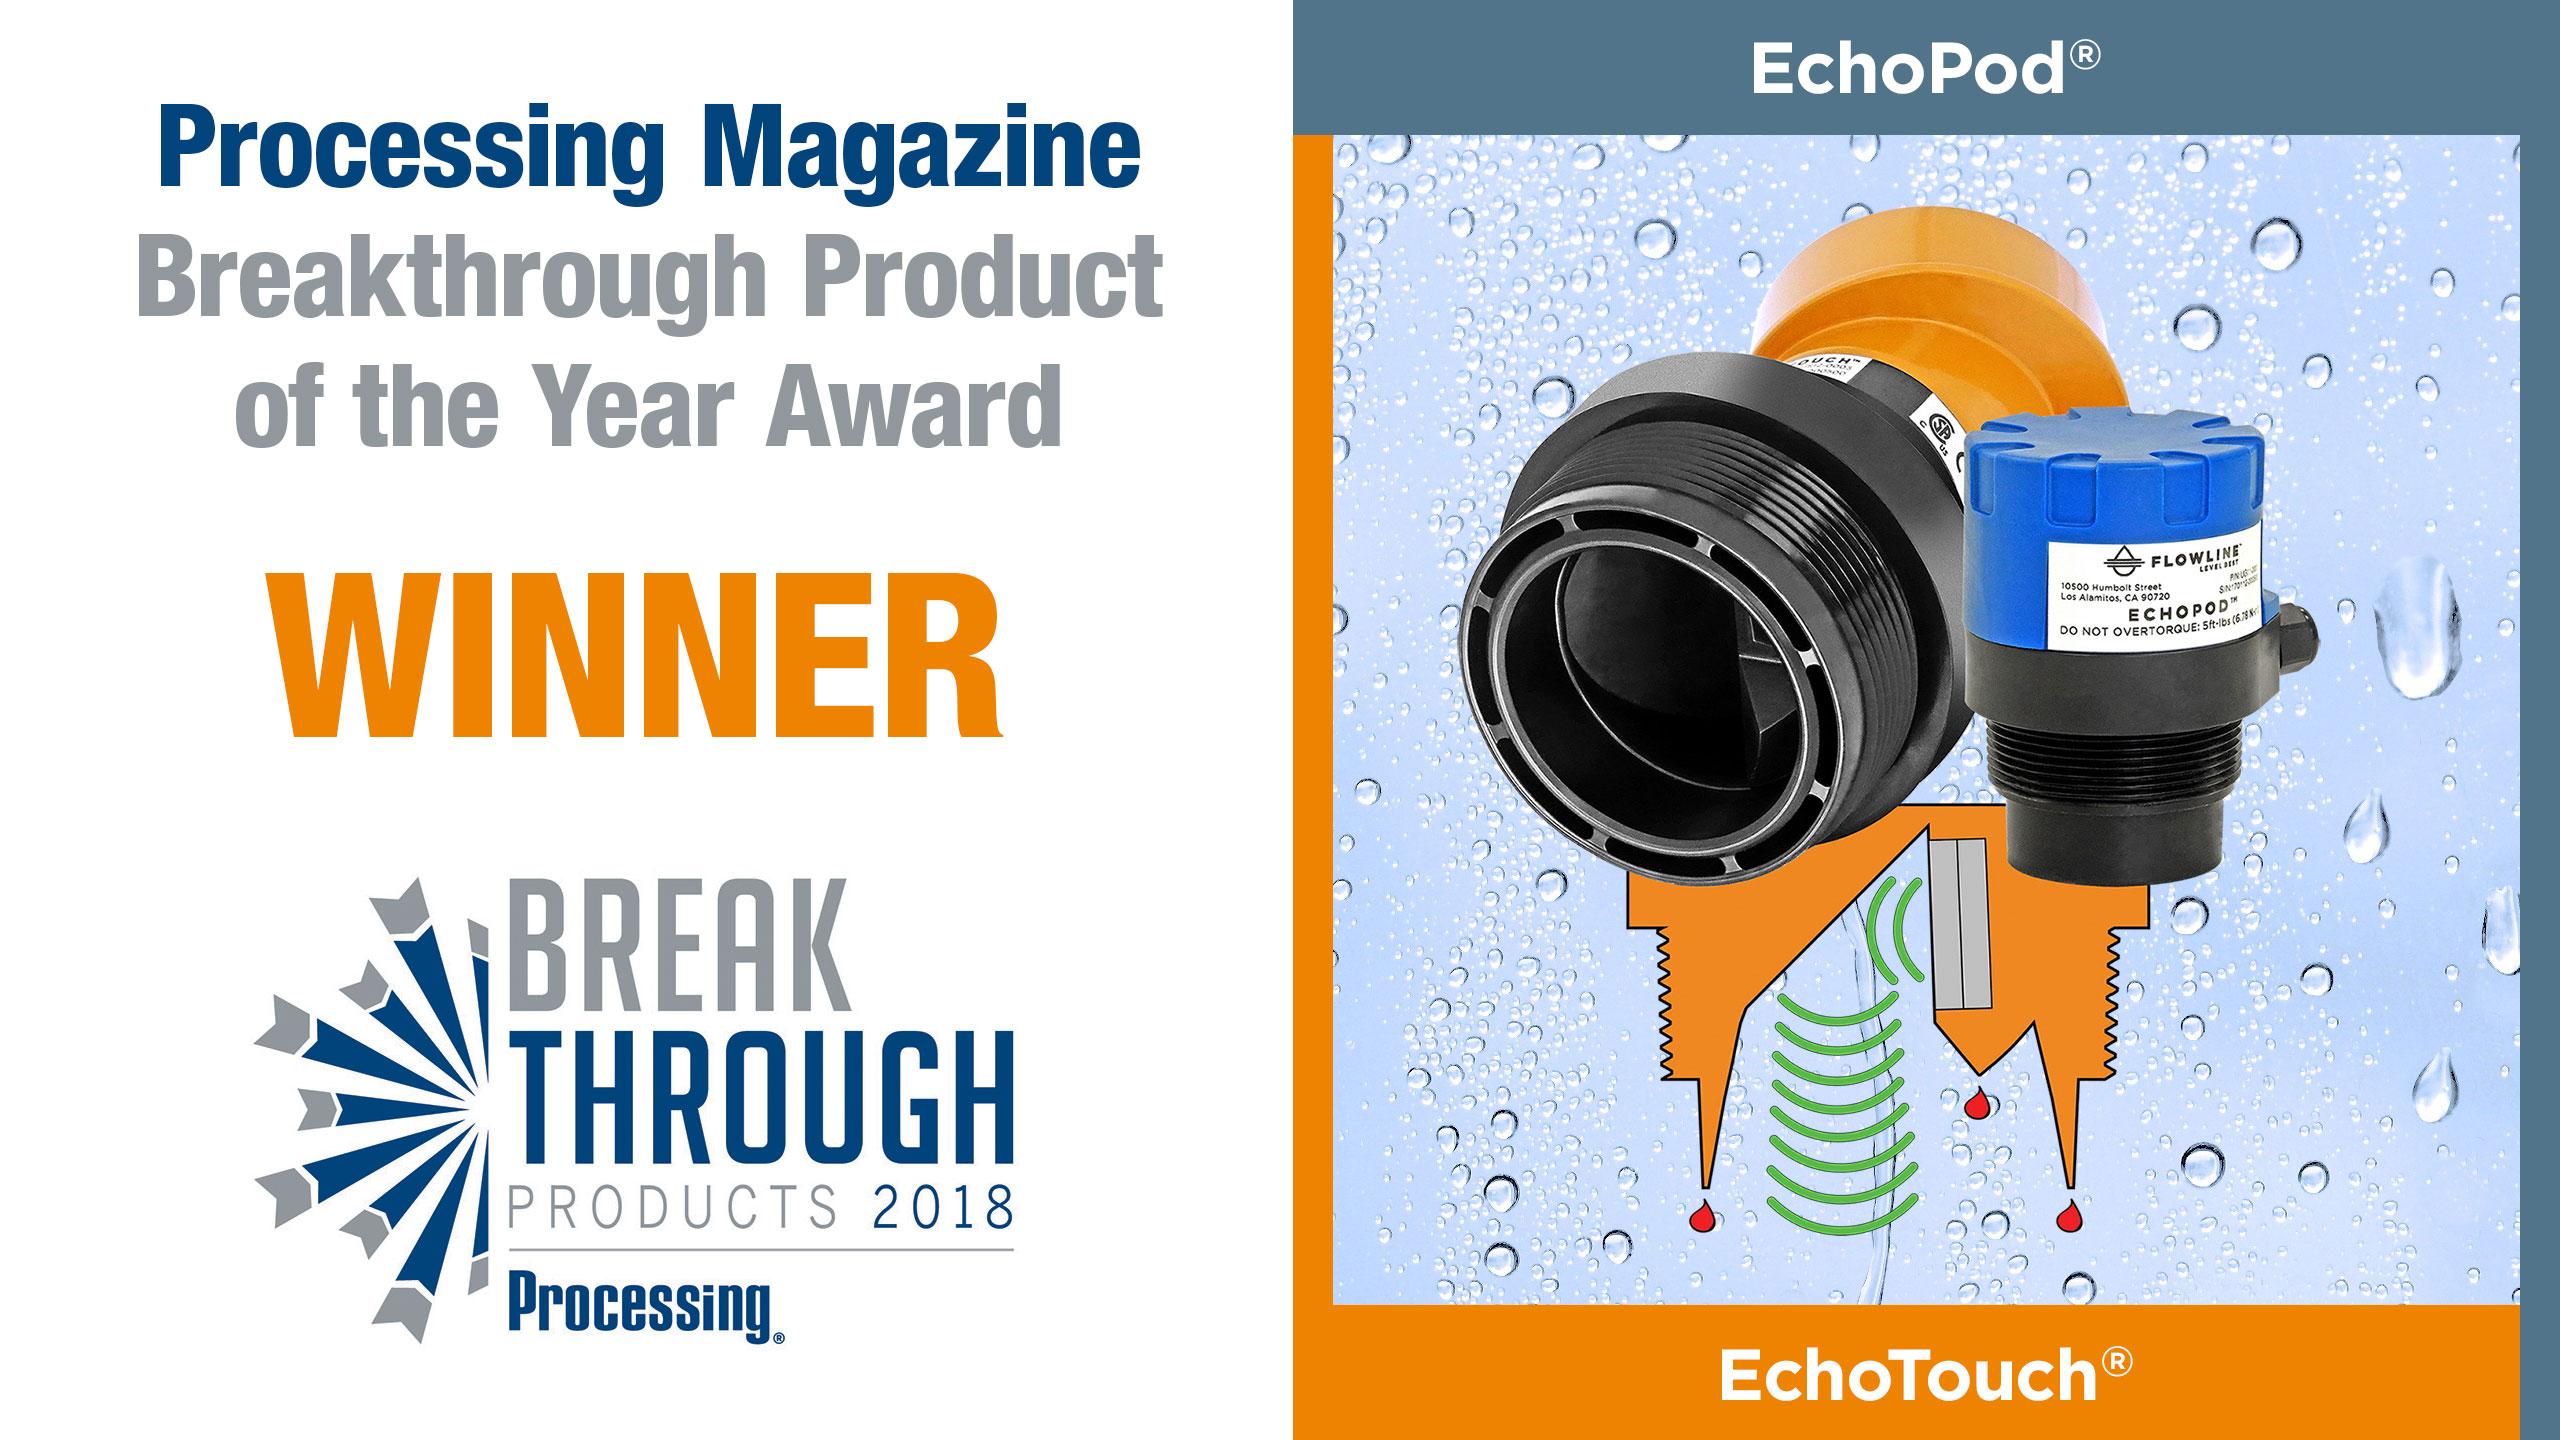 Breakthrough Product of the Year Award Winner